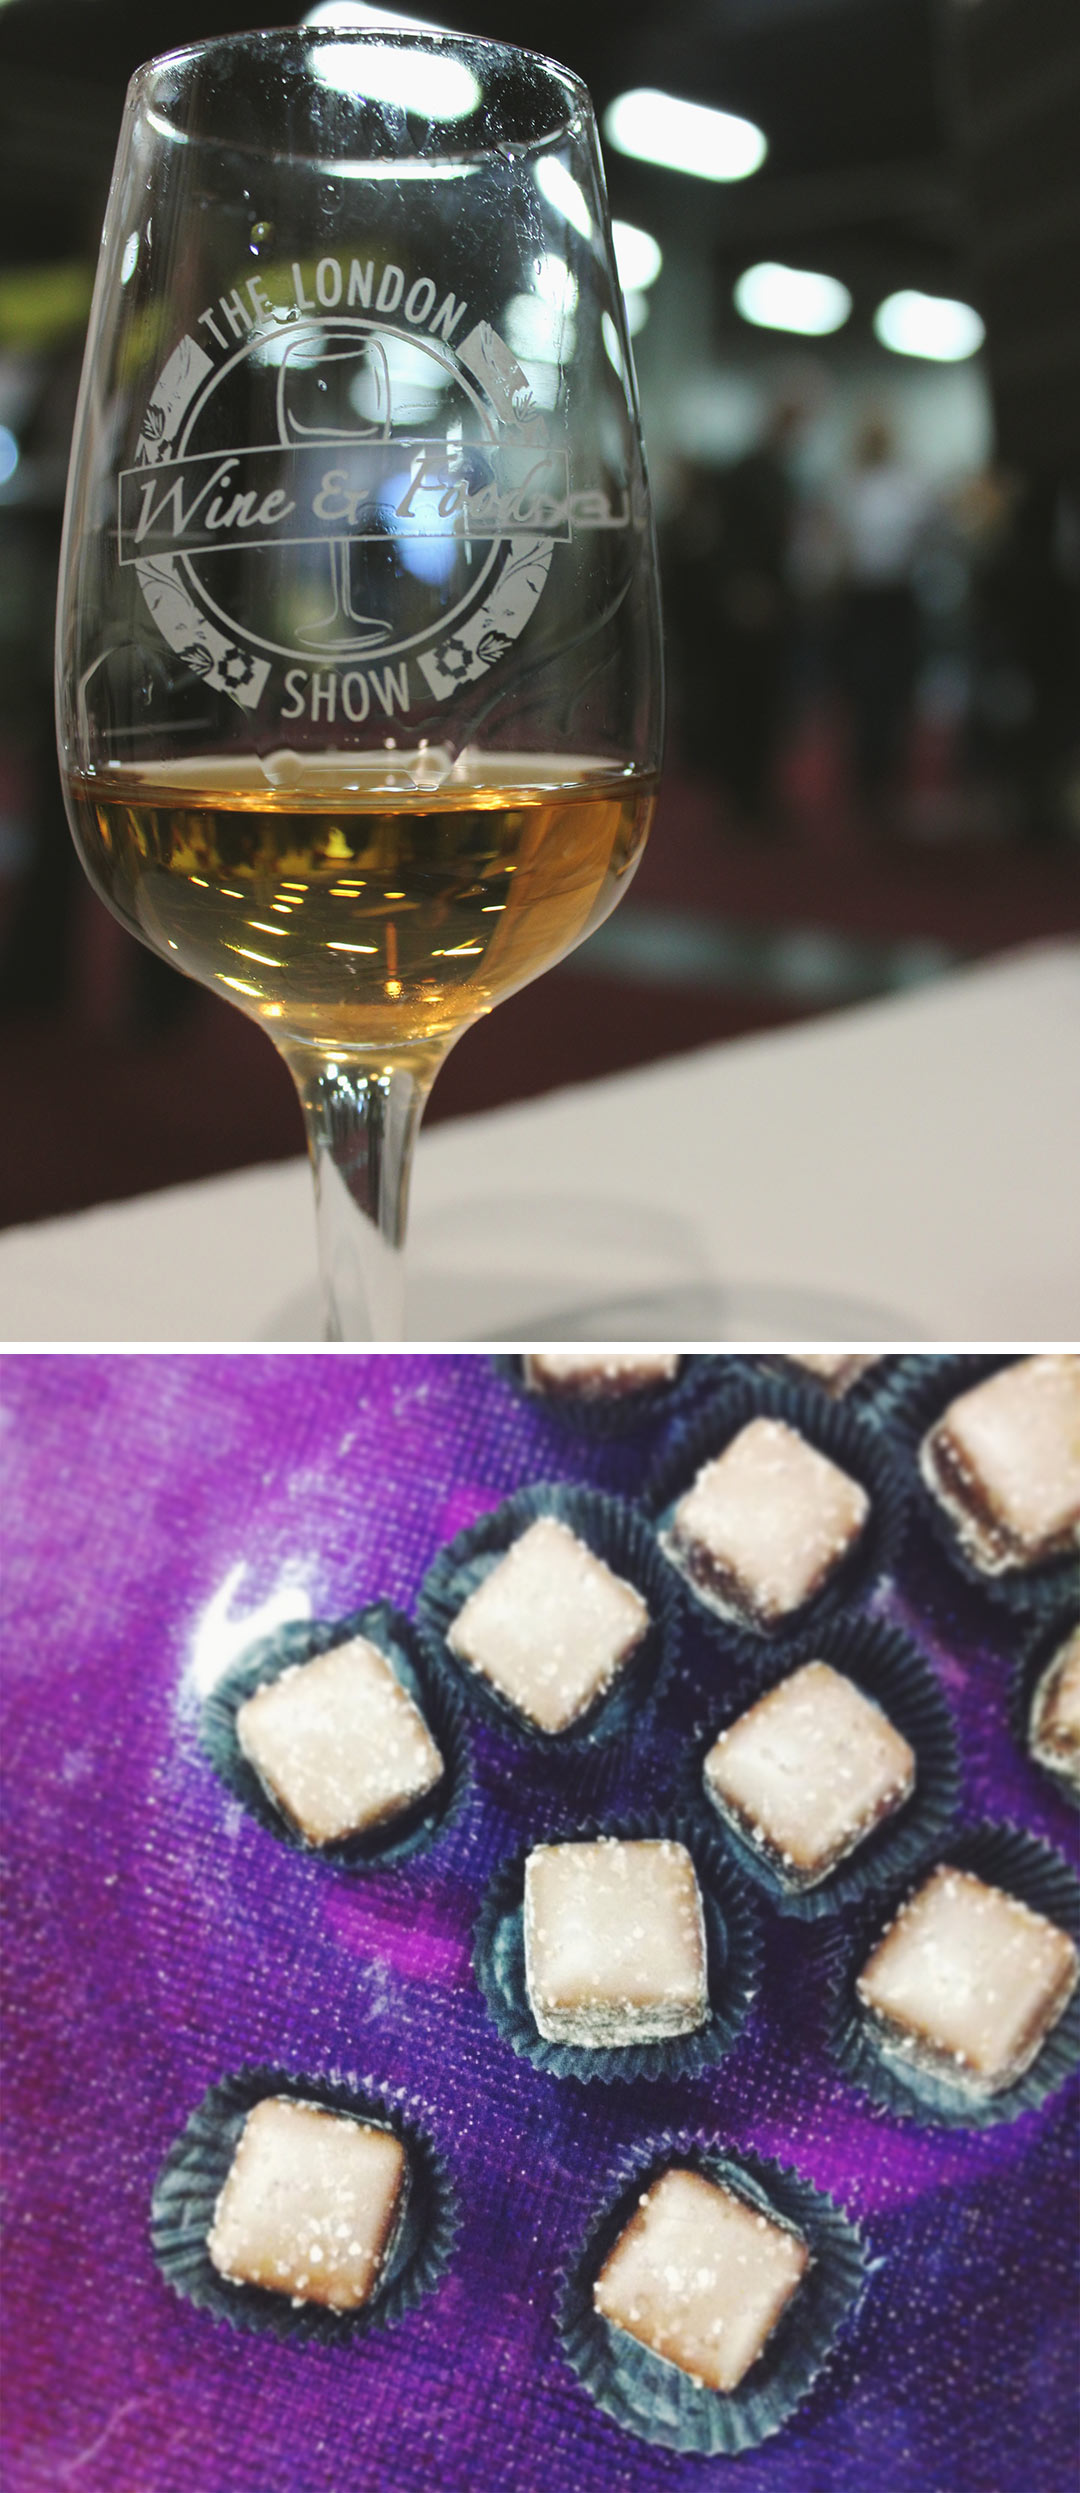 London-Wine-Food-Show-2014